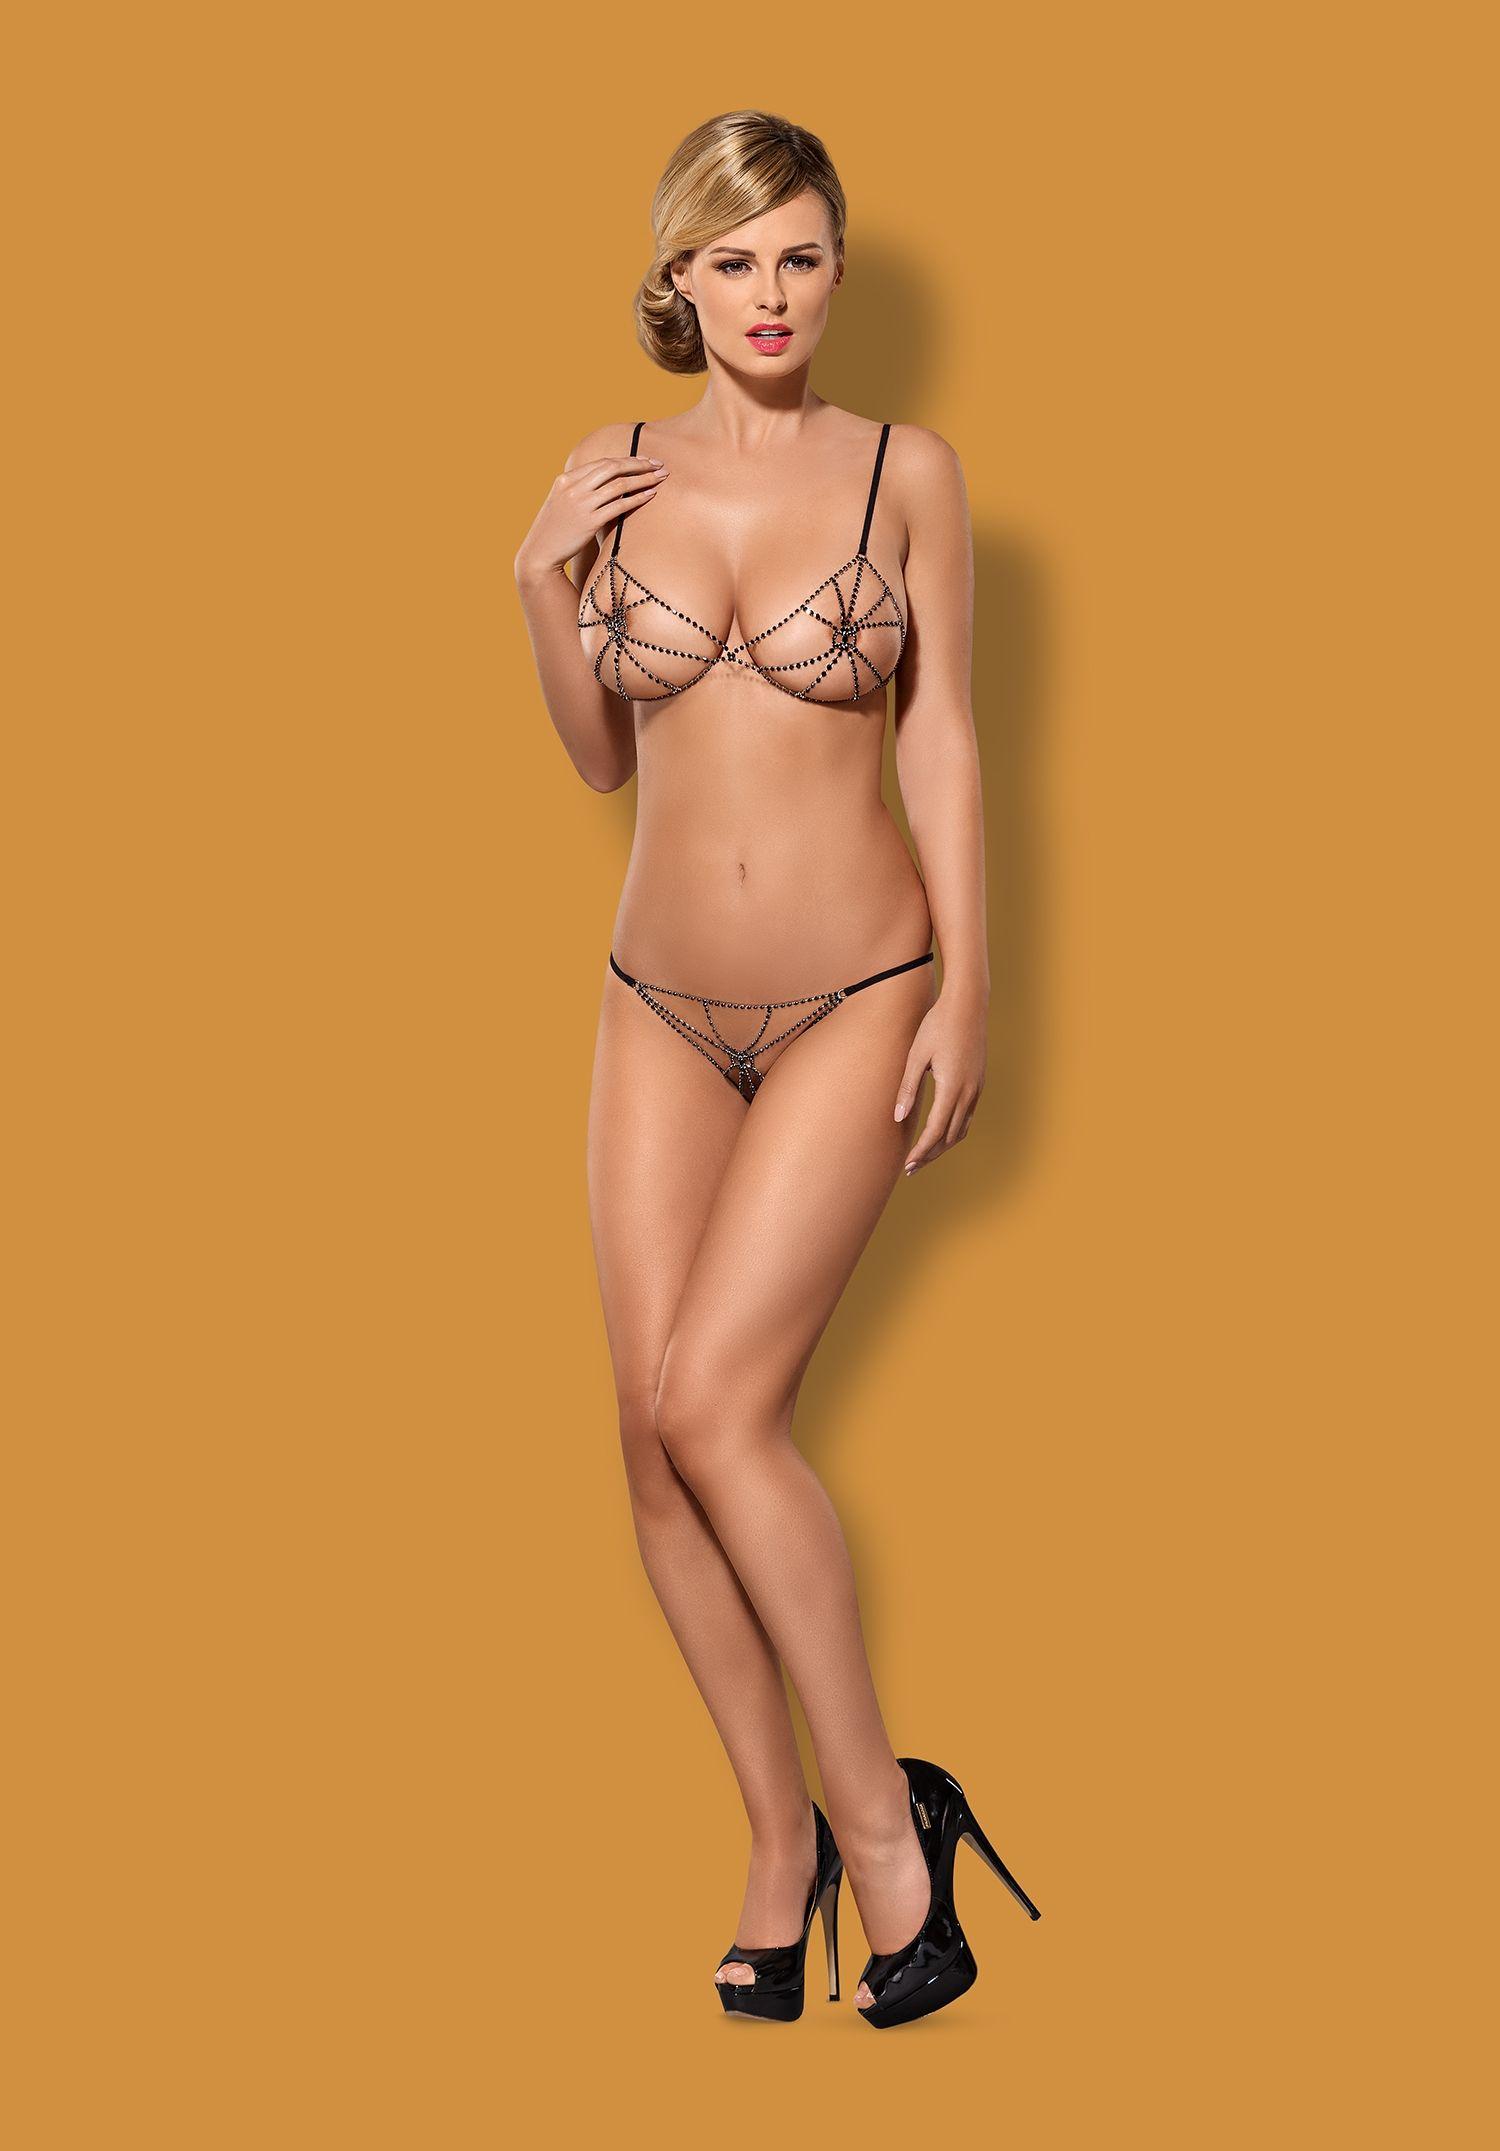 Nude girl hidden cam gif